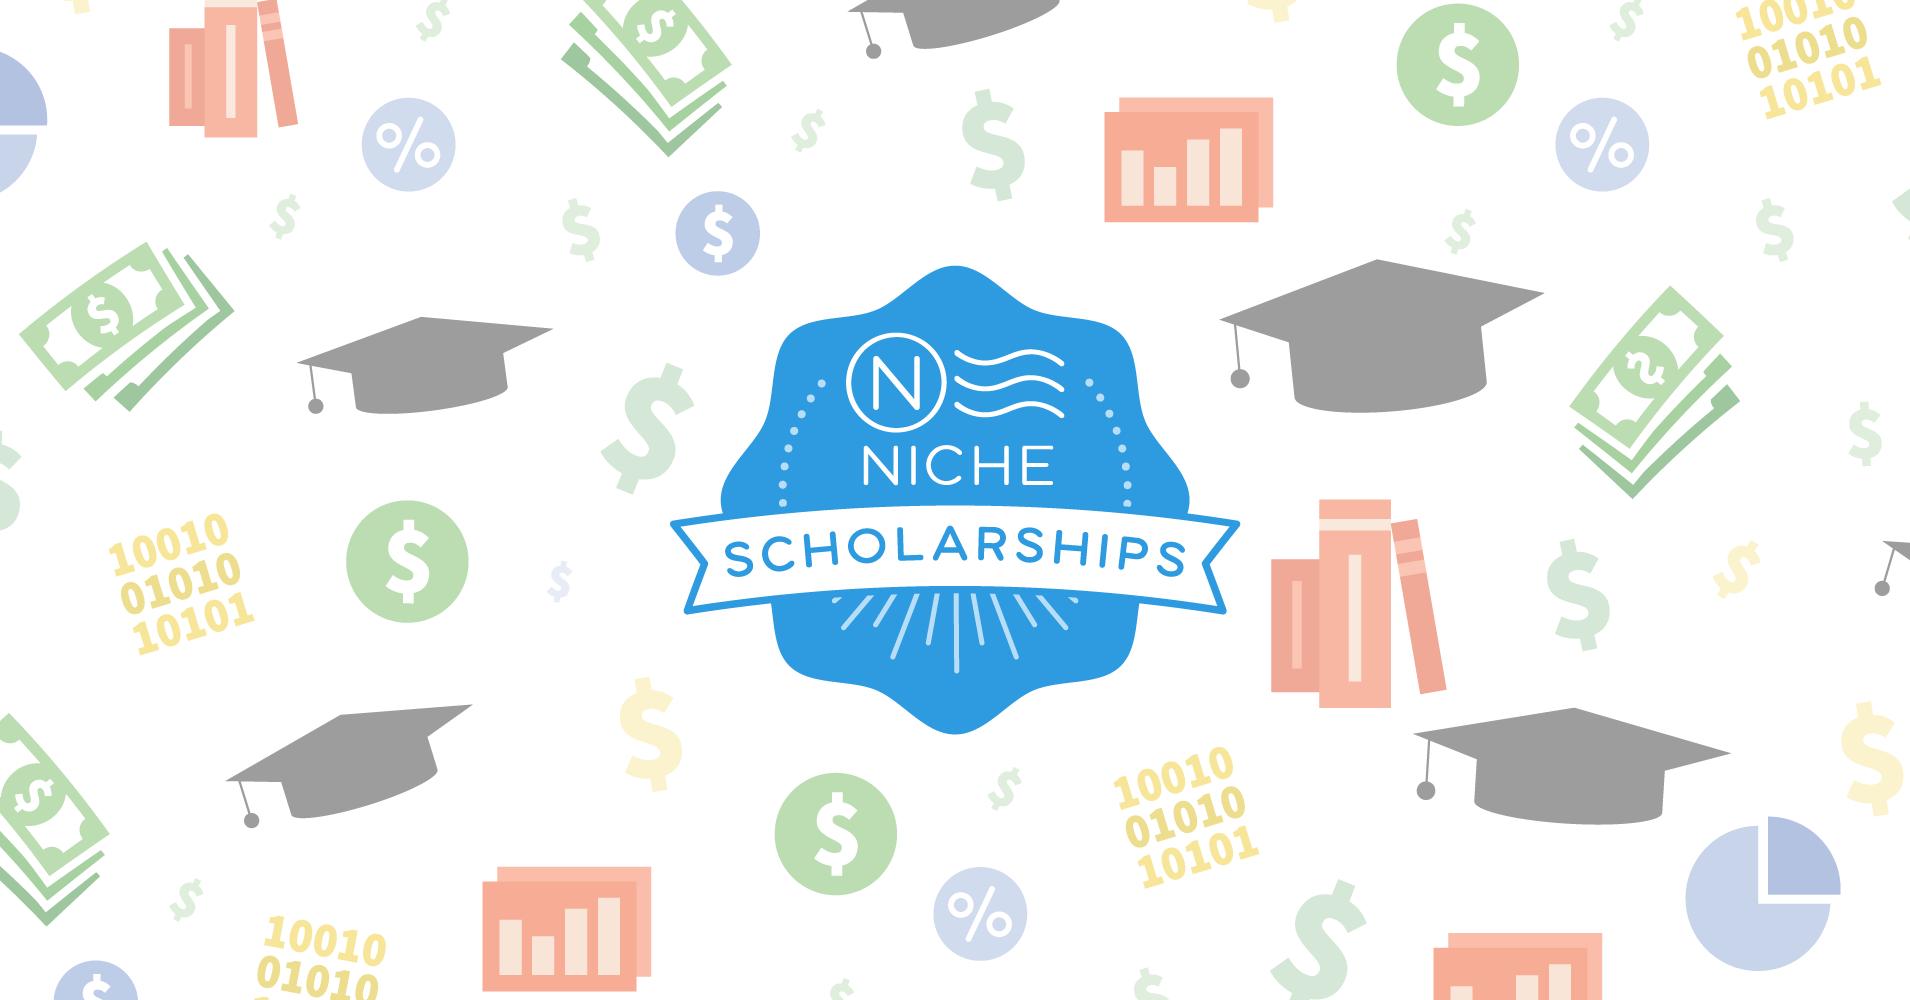 005 Essay Example Niche No Scholarship Marvelous Reddit Winners Full